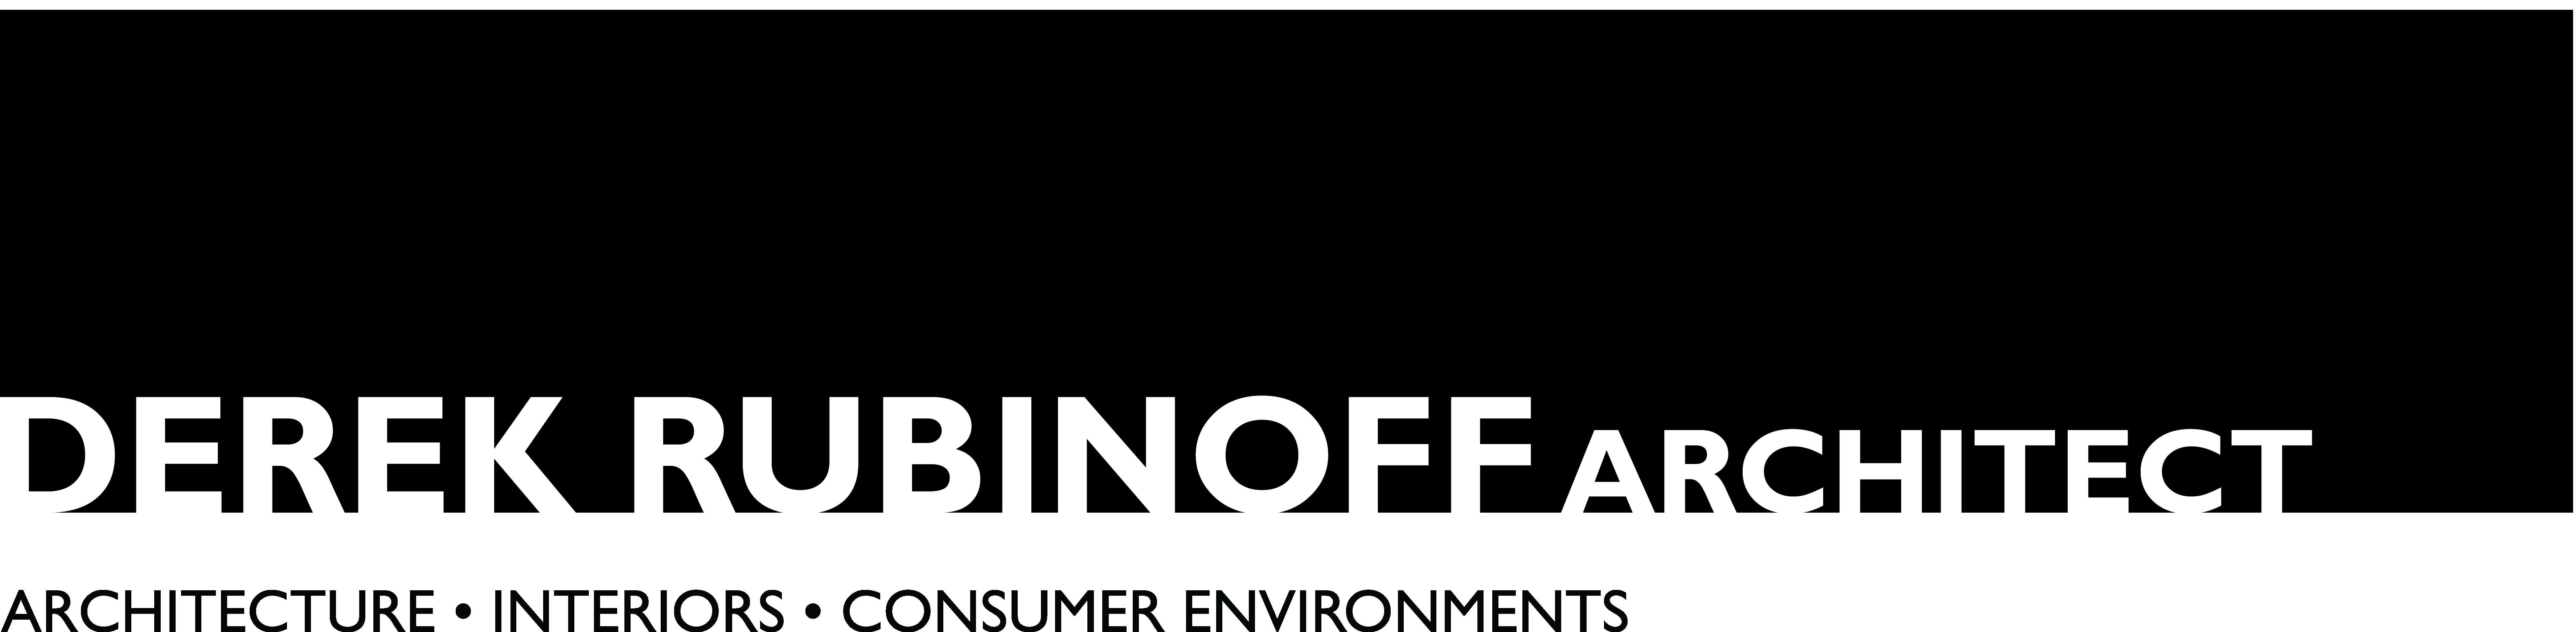 Derek Rubinoff Architect logo band